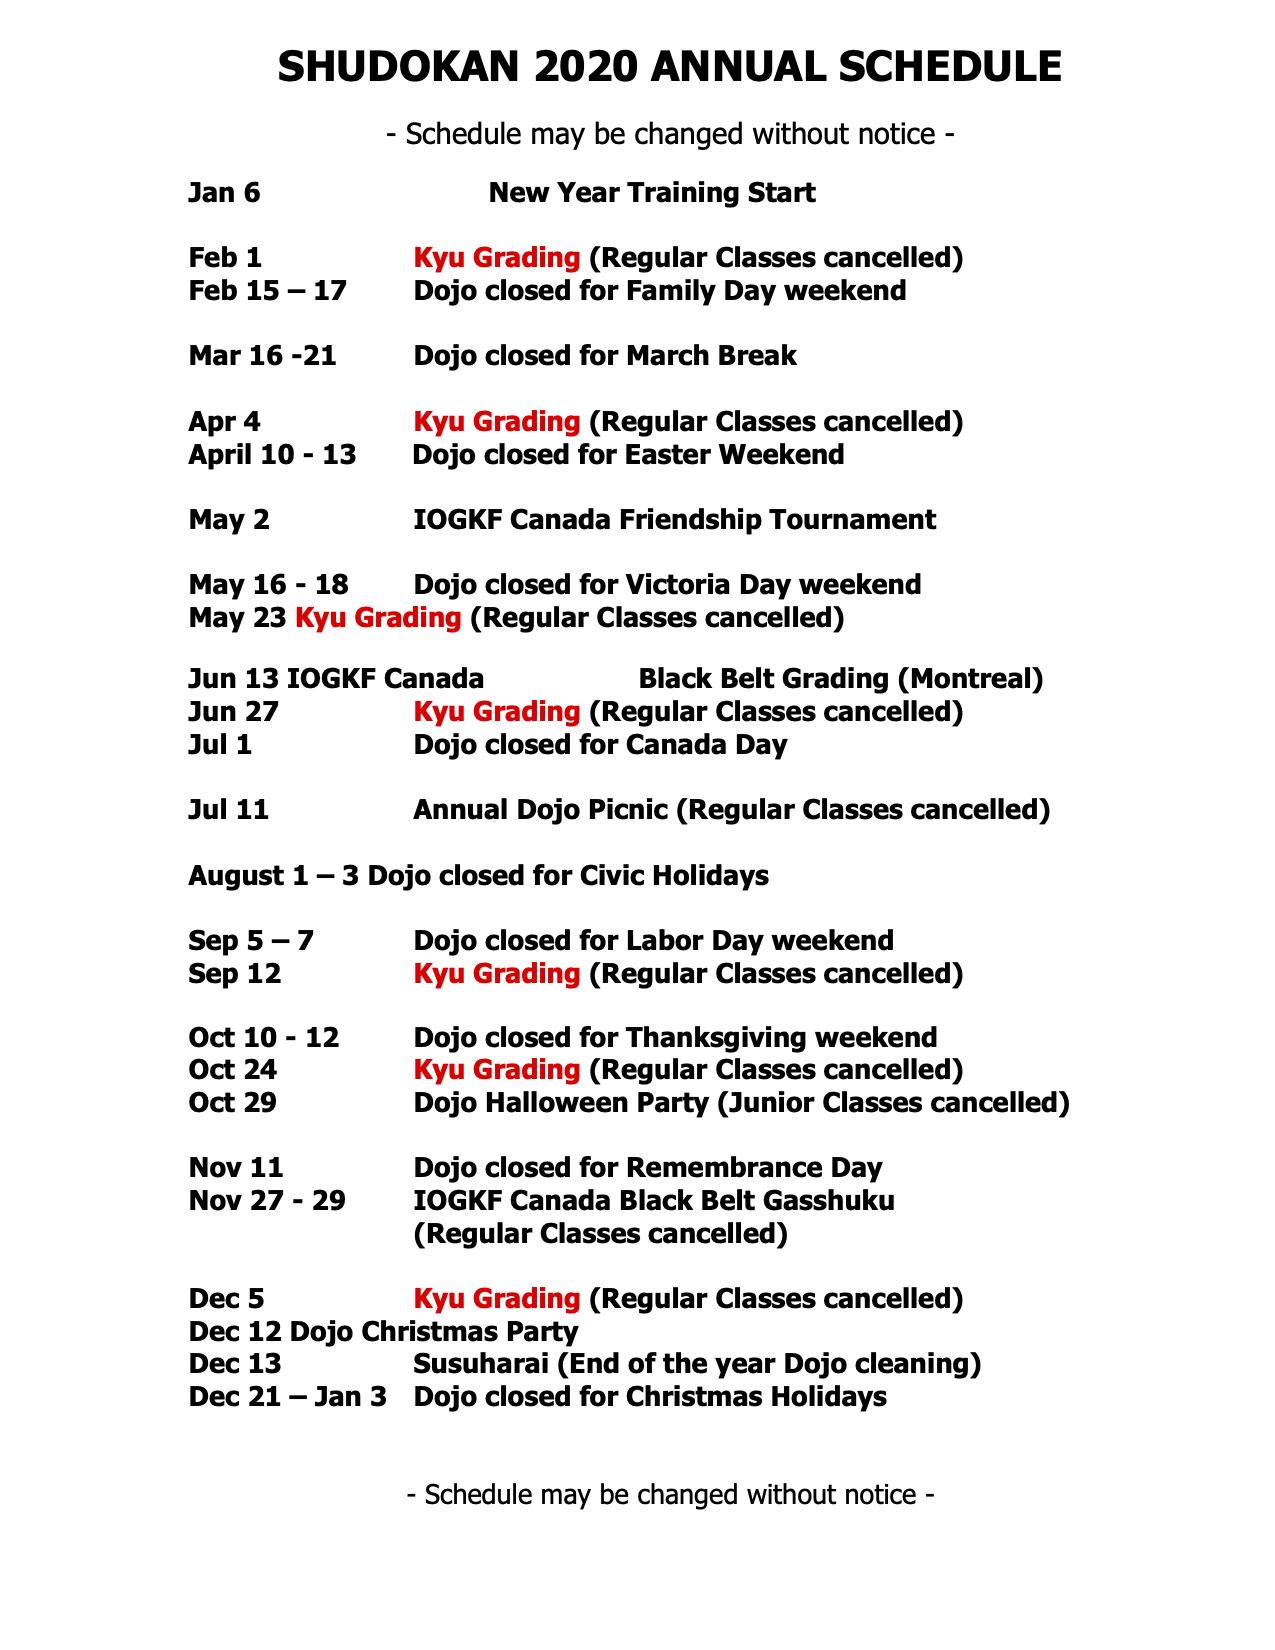 shudokan-2020-annual-schedule